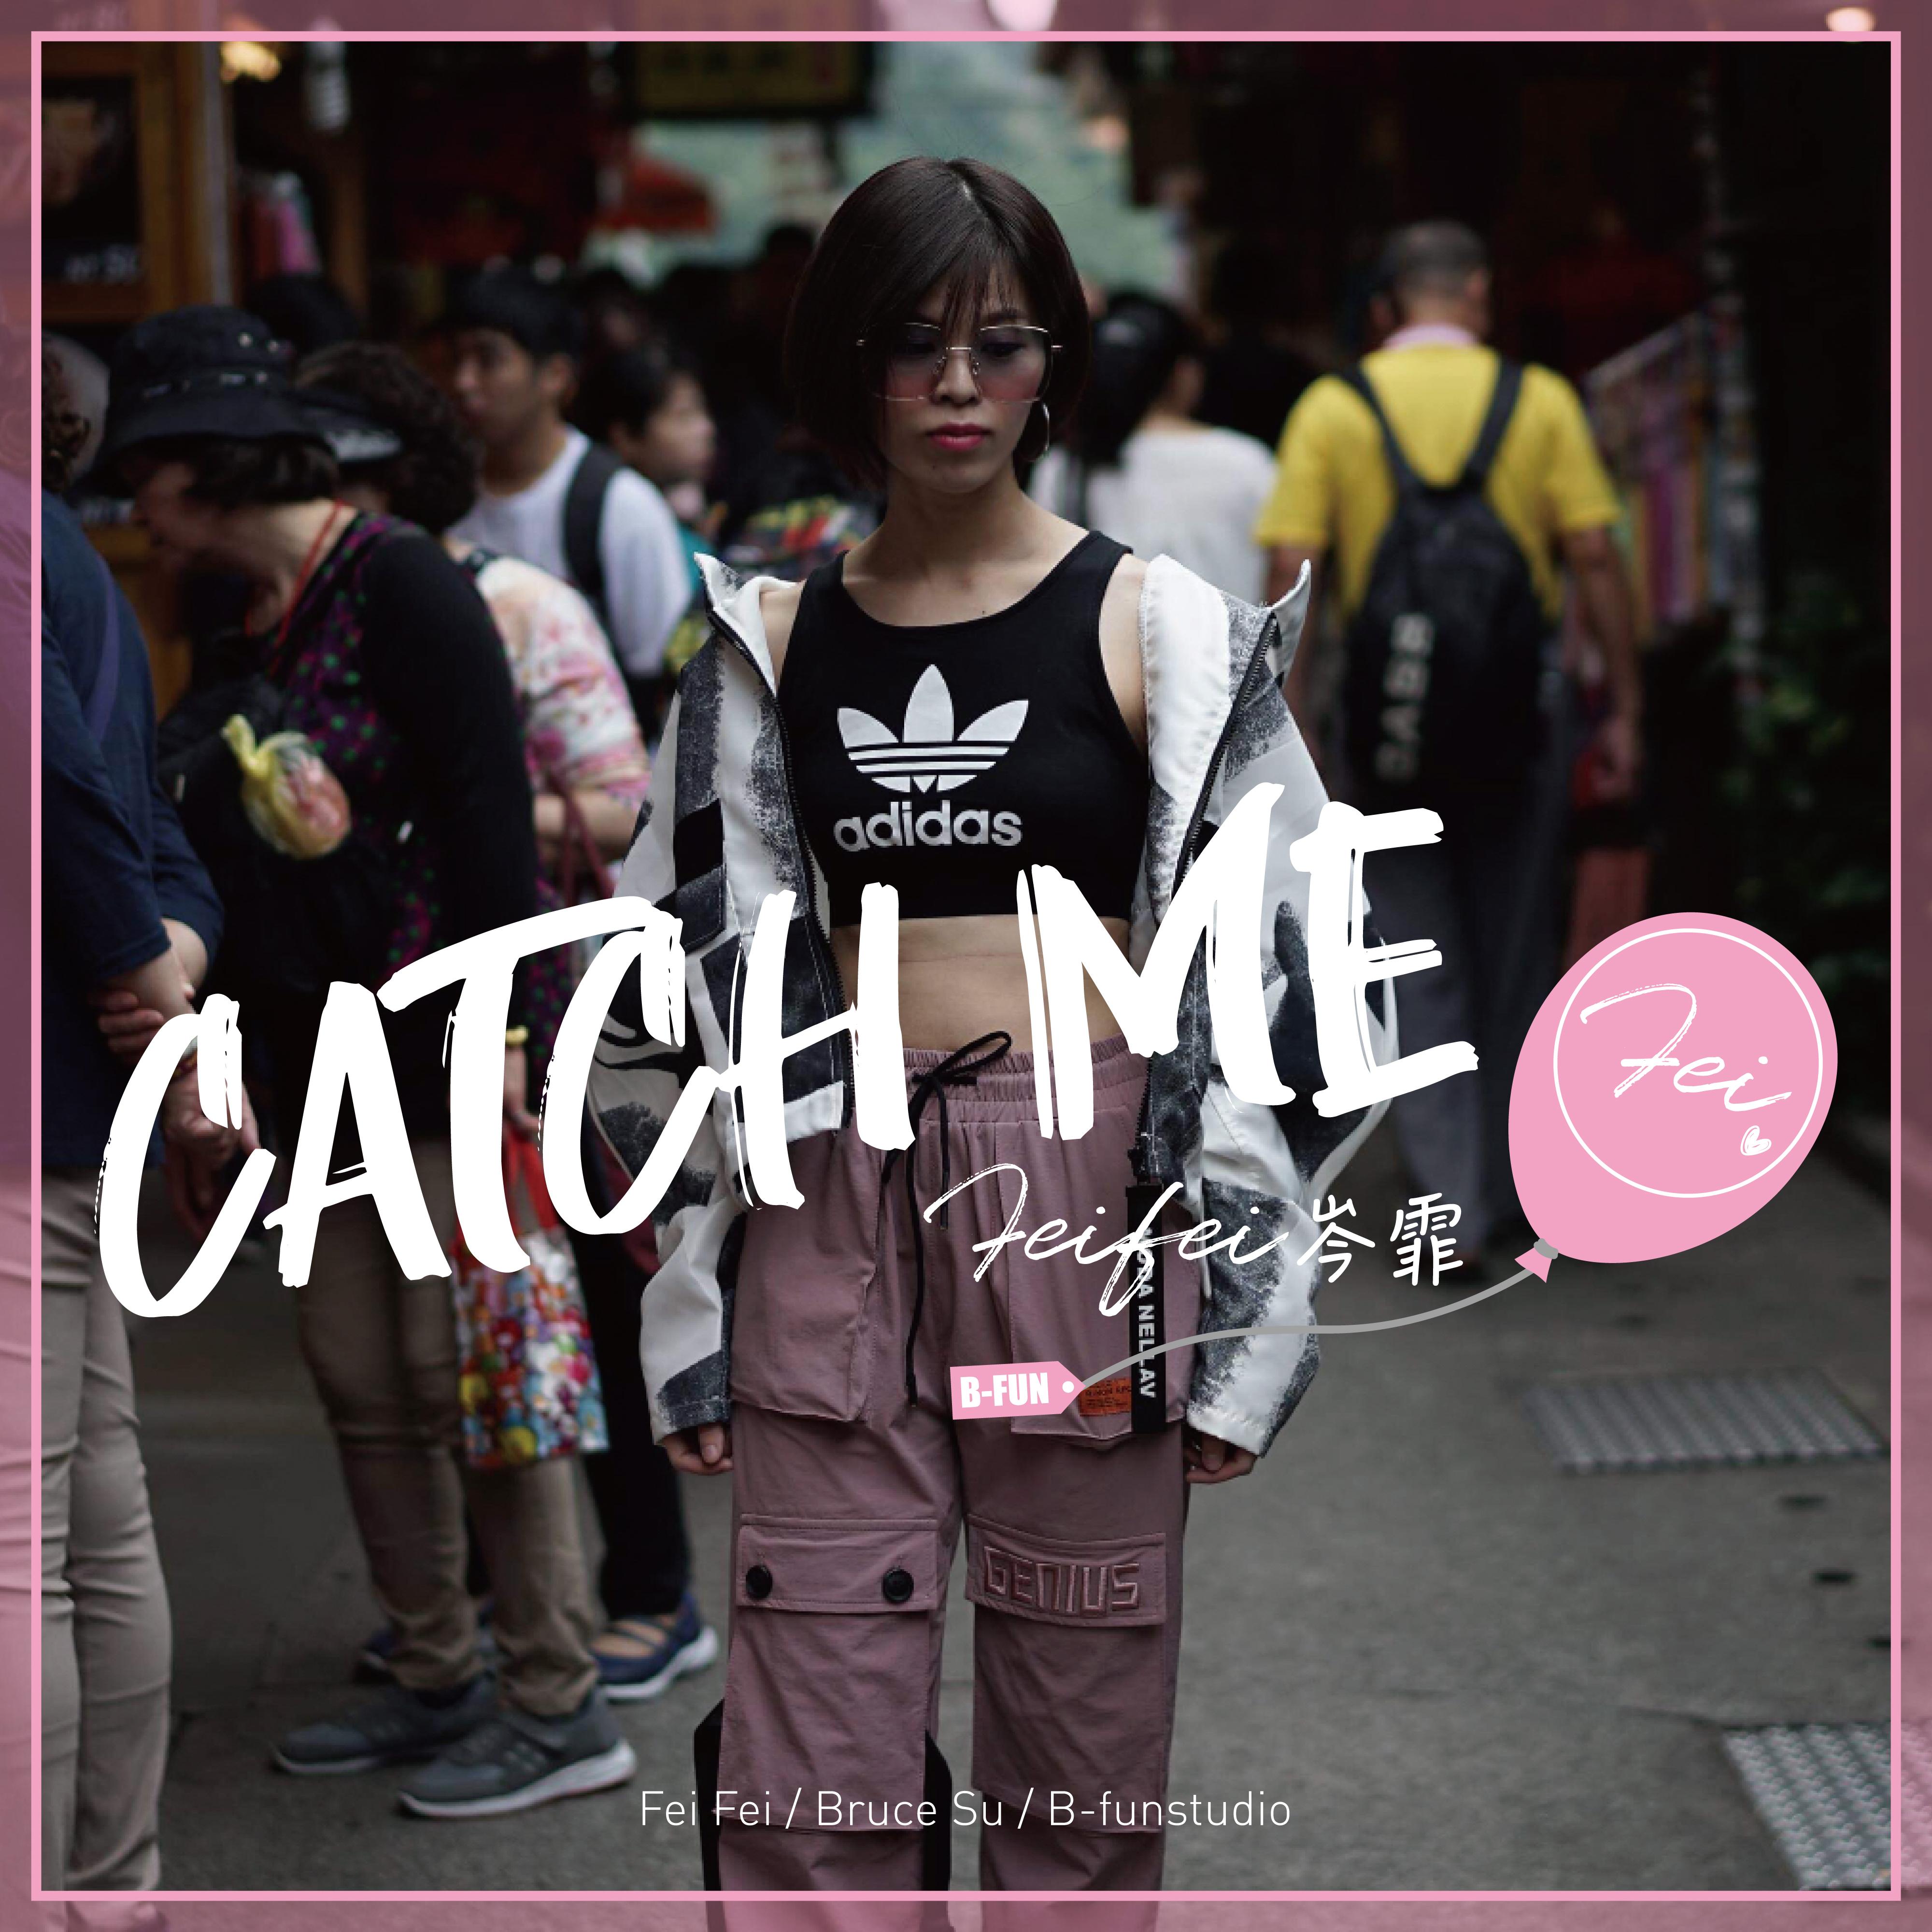 岑霏Fei Fe:Catch me